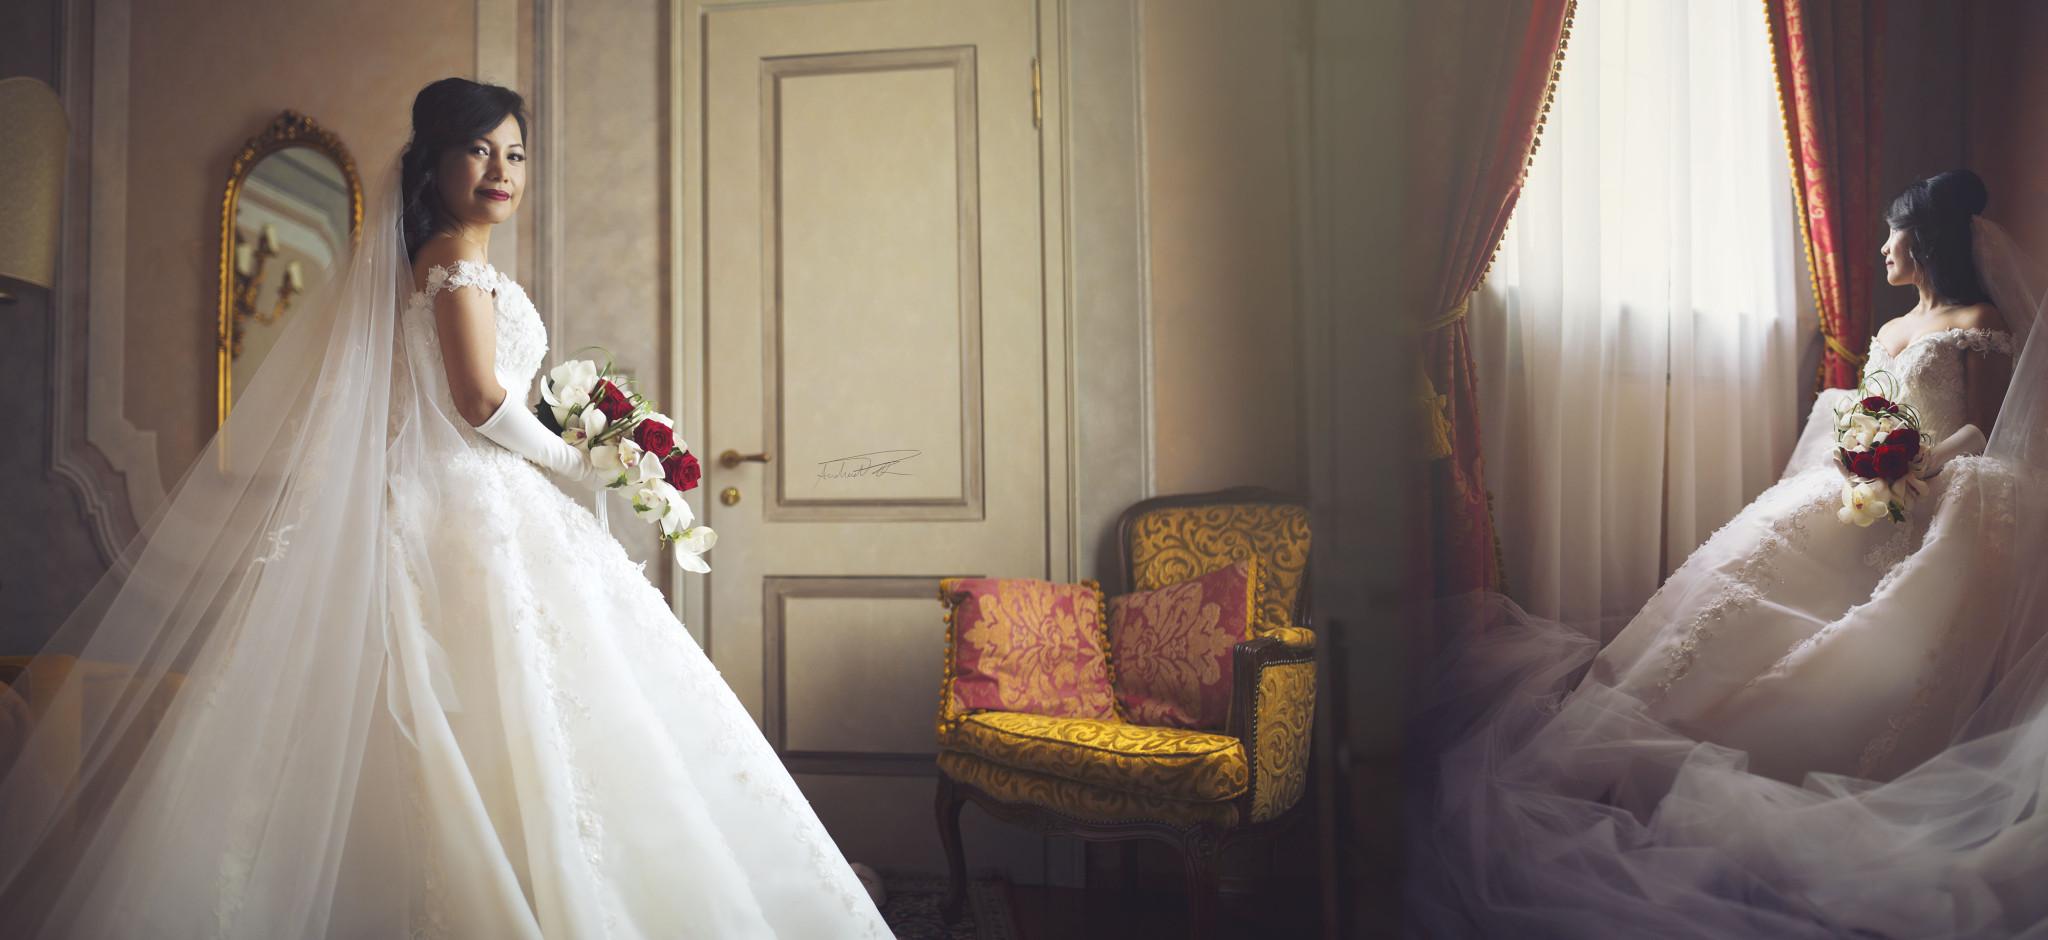 Andrea Prestana Matrimoni Treviso